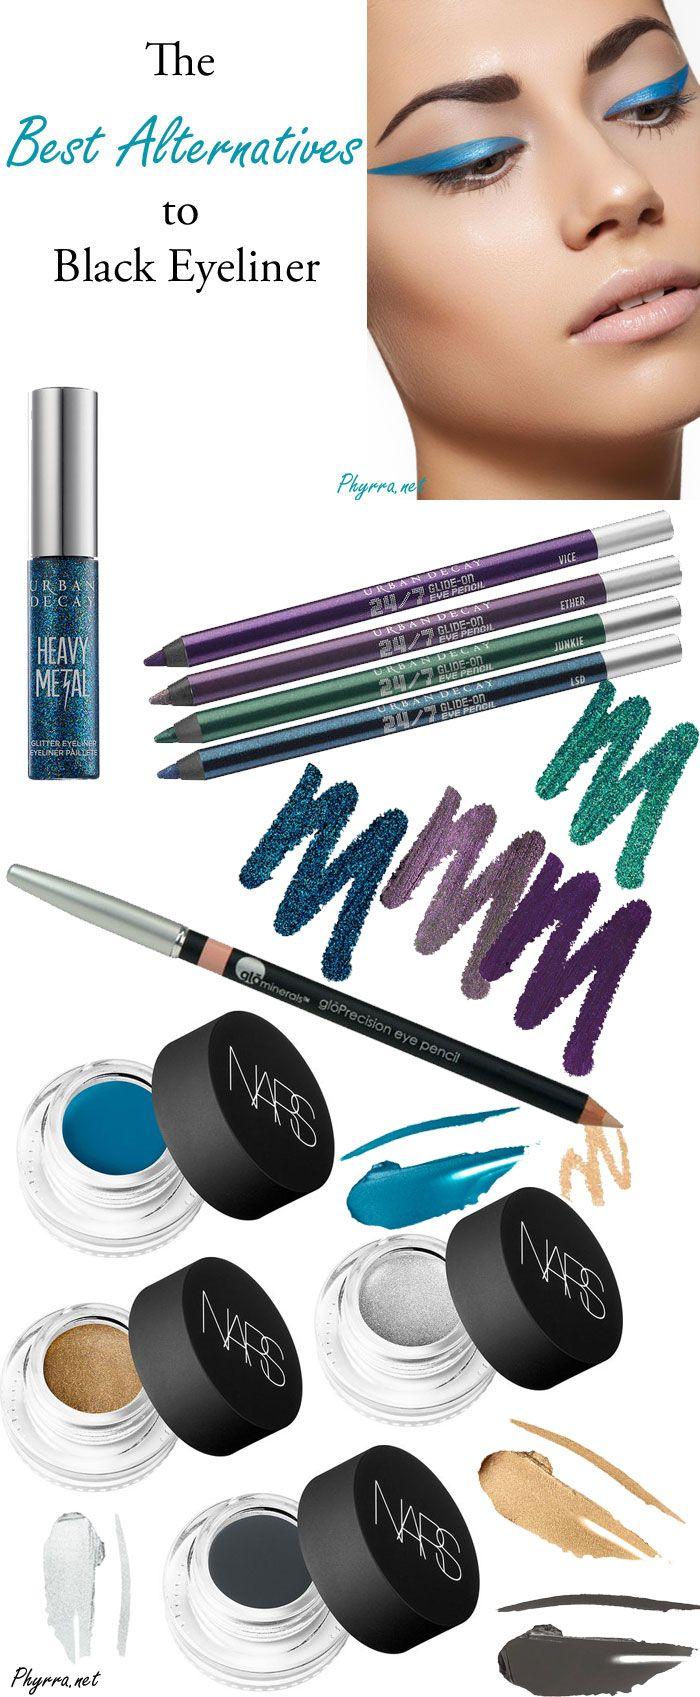 Best Alternatives to Black Eyeliner